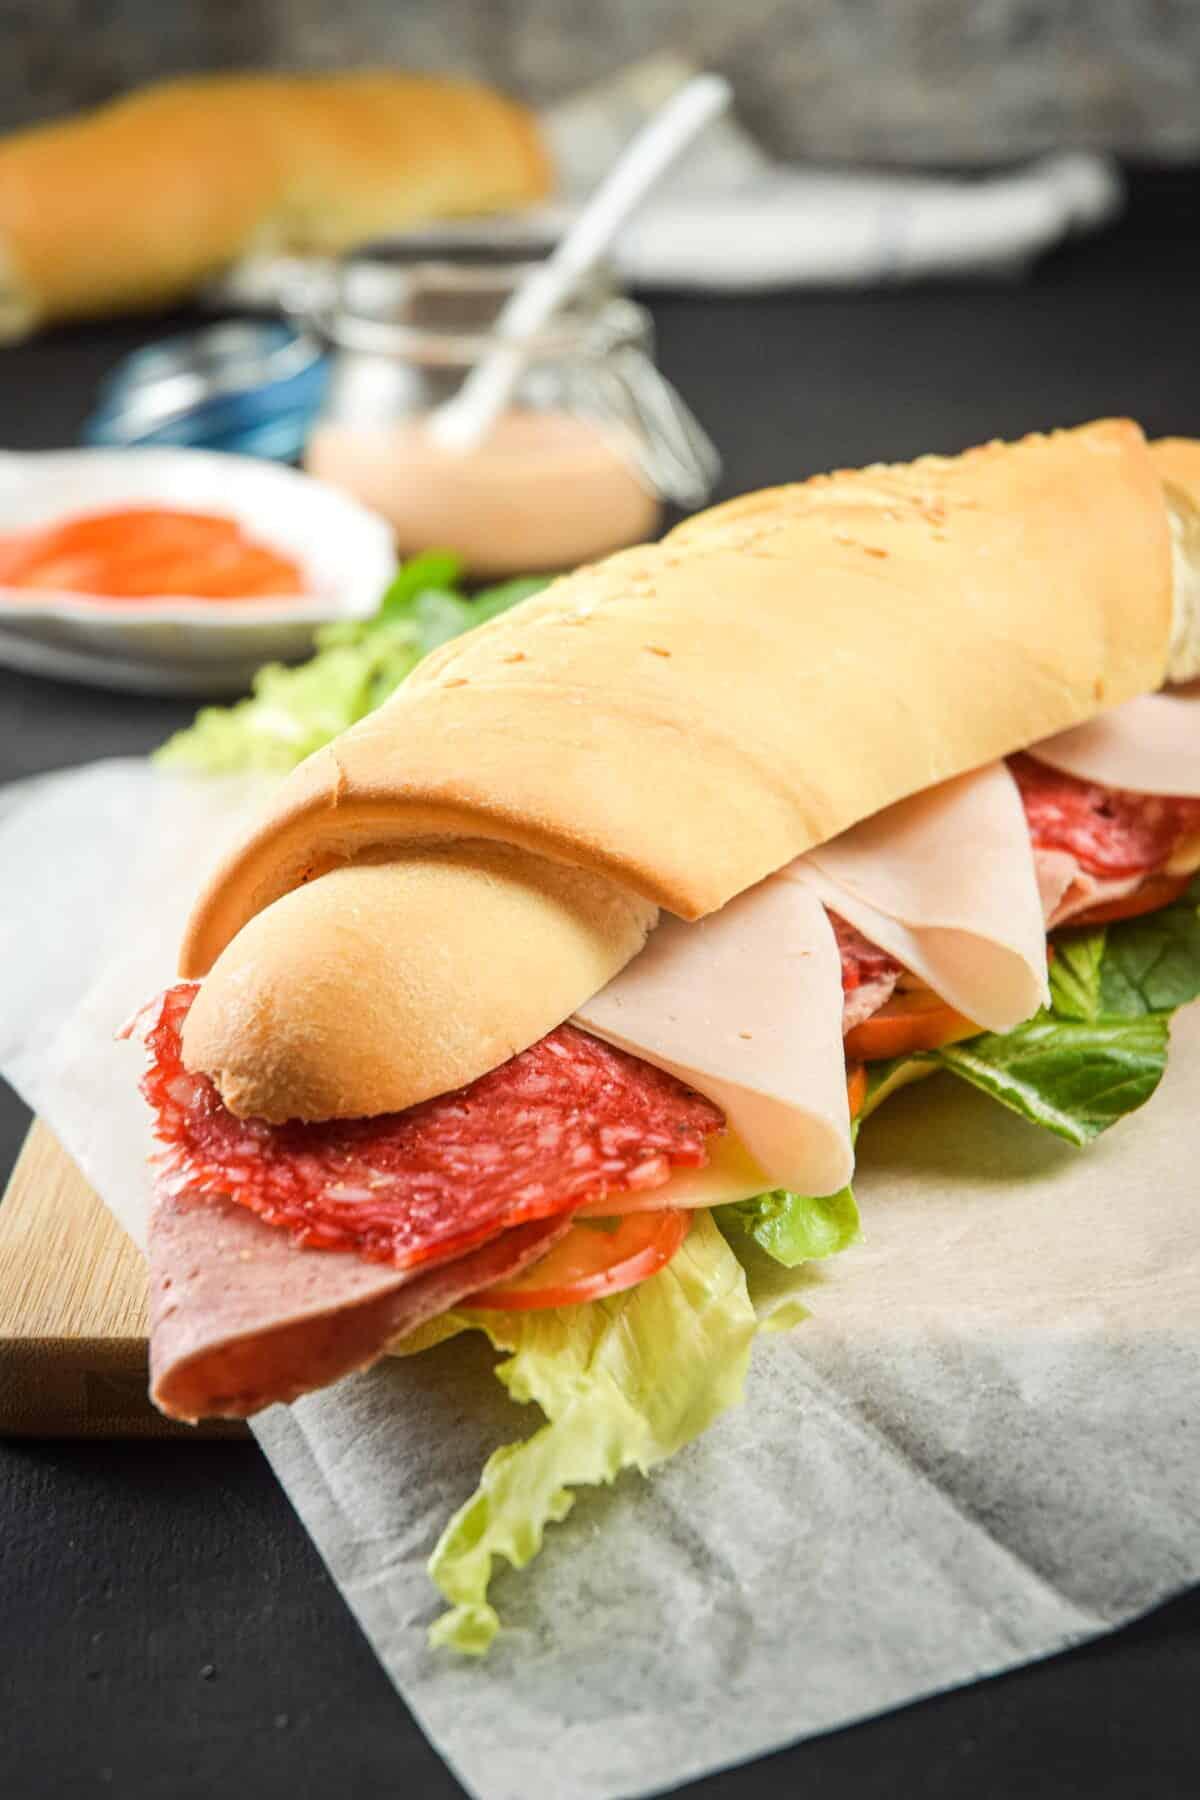 Triple meat sub sandwich with sriracha sauce on wooden cutting board.